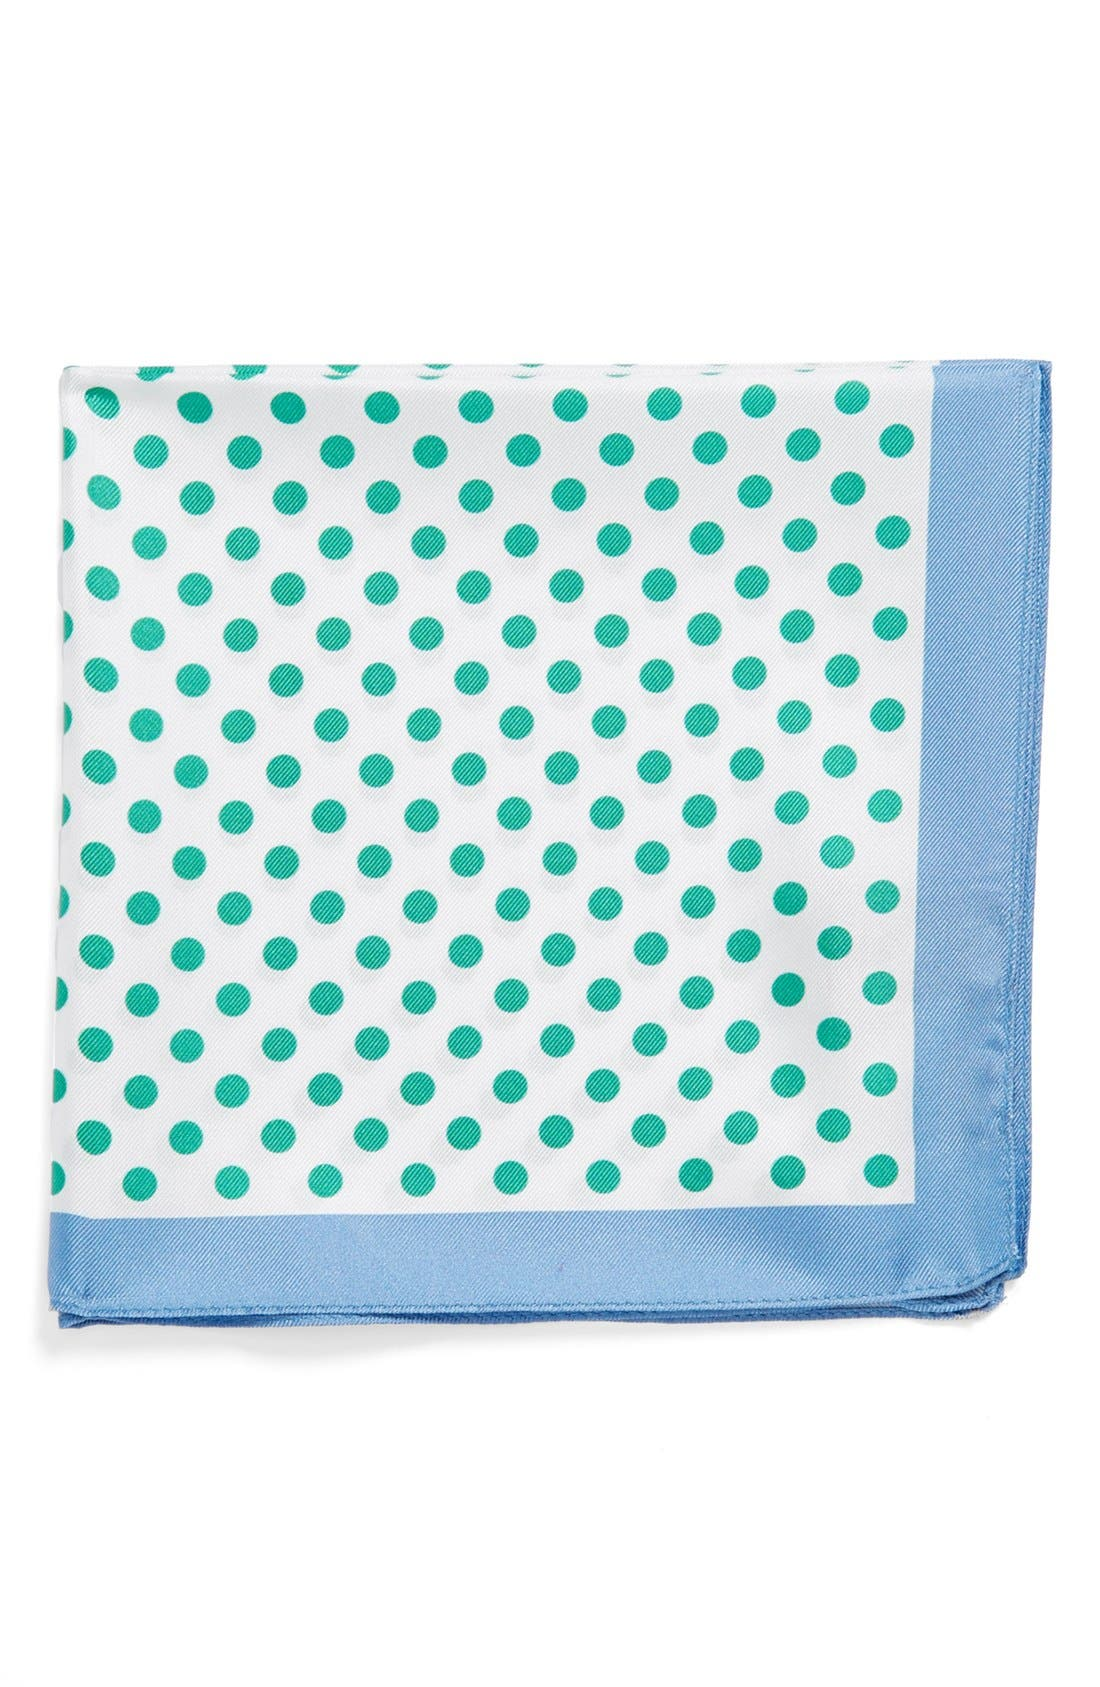 Main Image - BOSS HUGO BOSS Silk Pocket Square